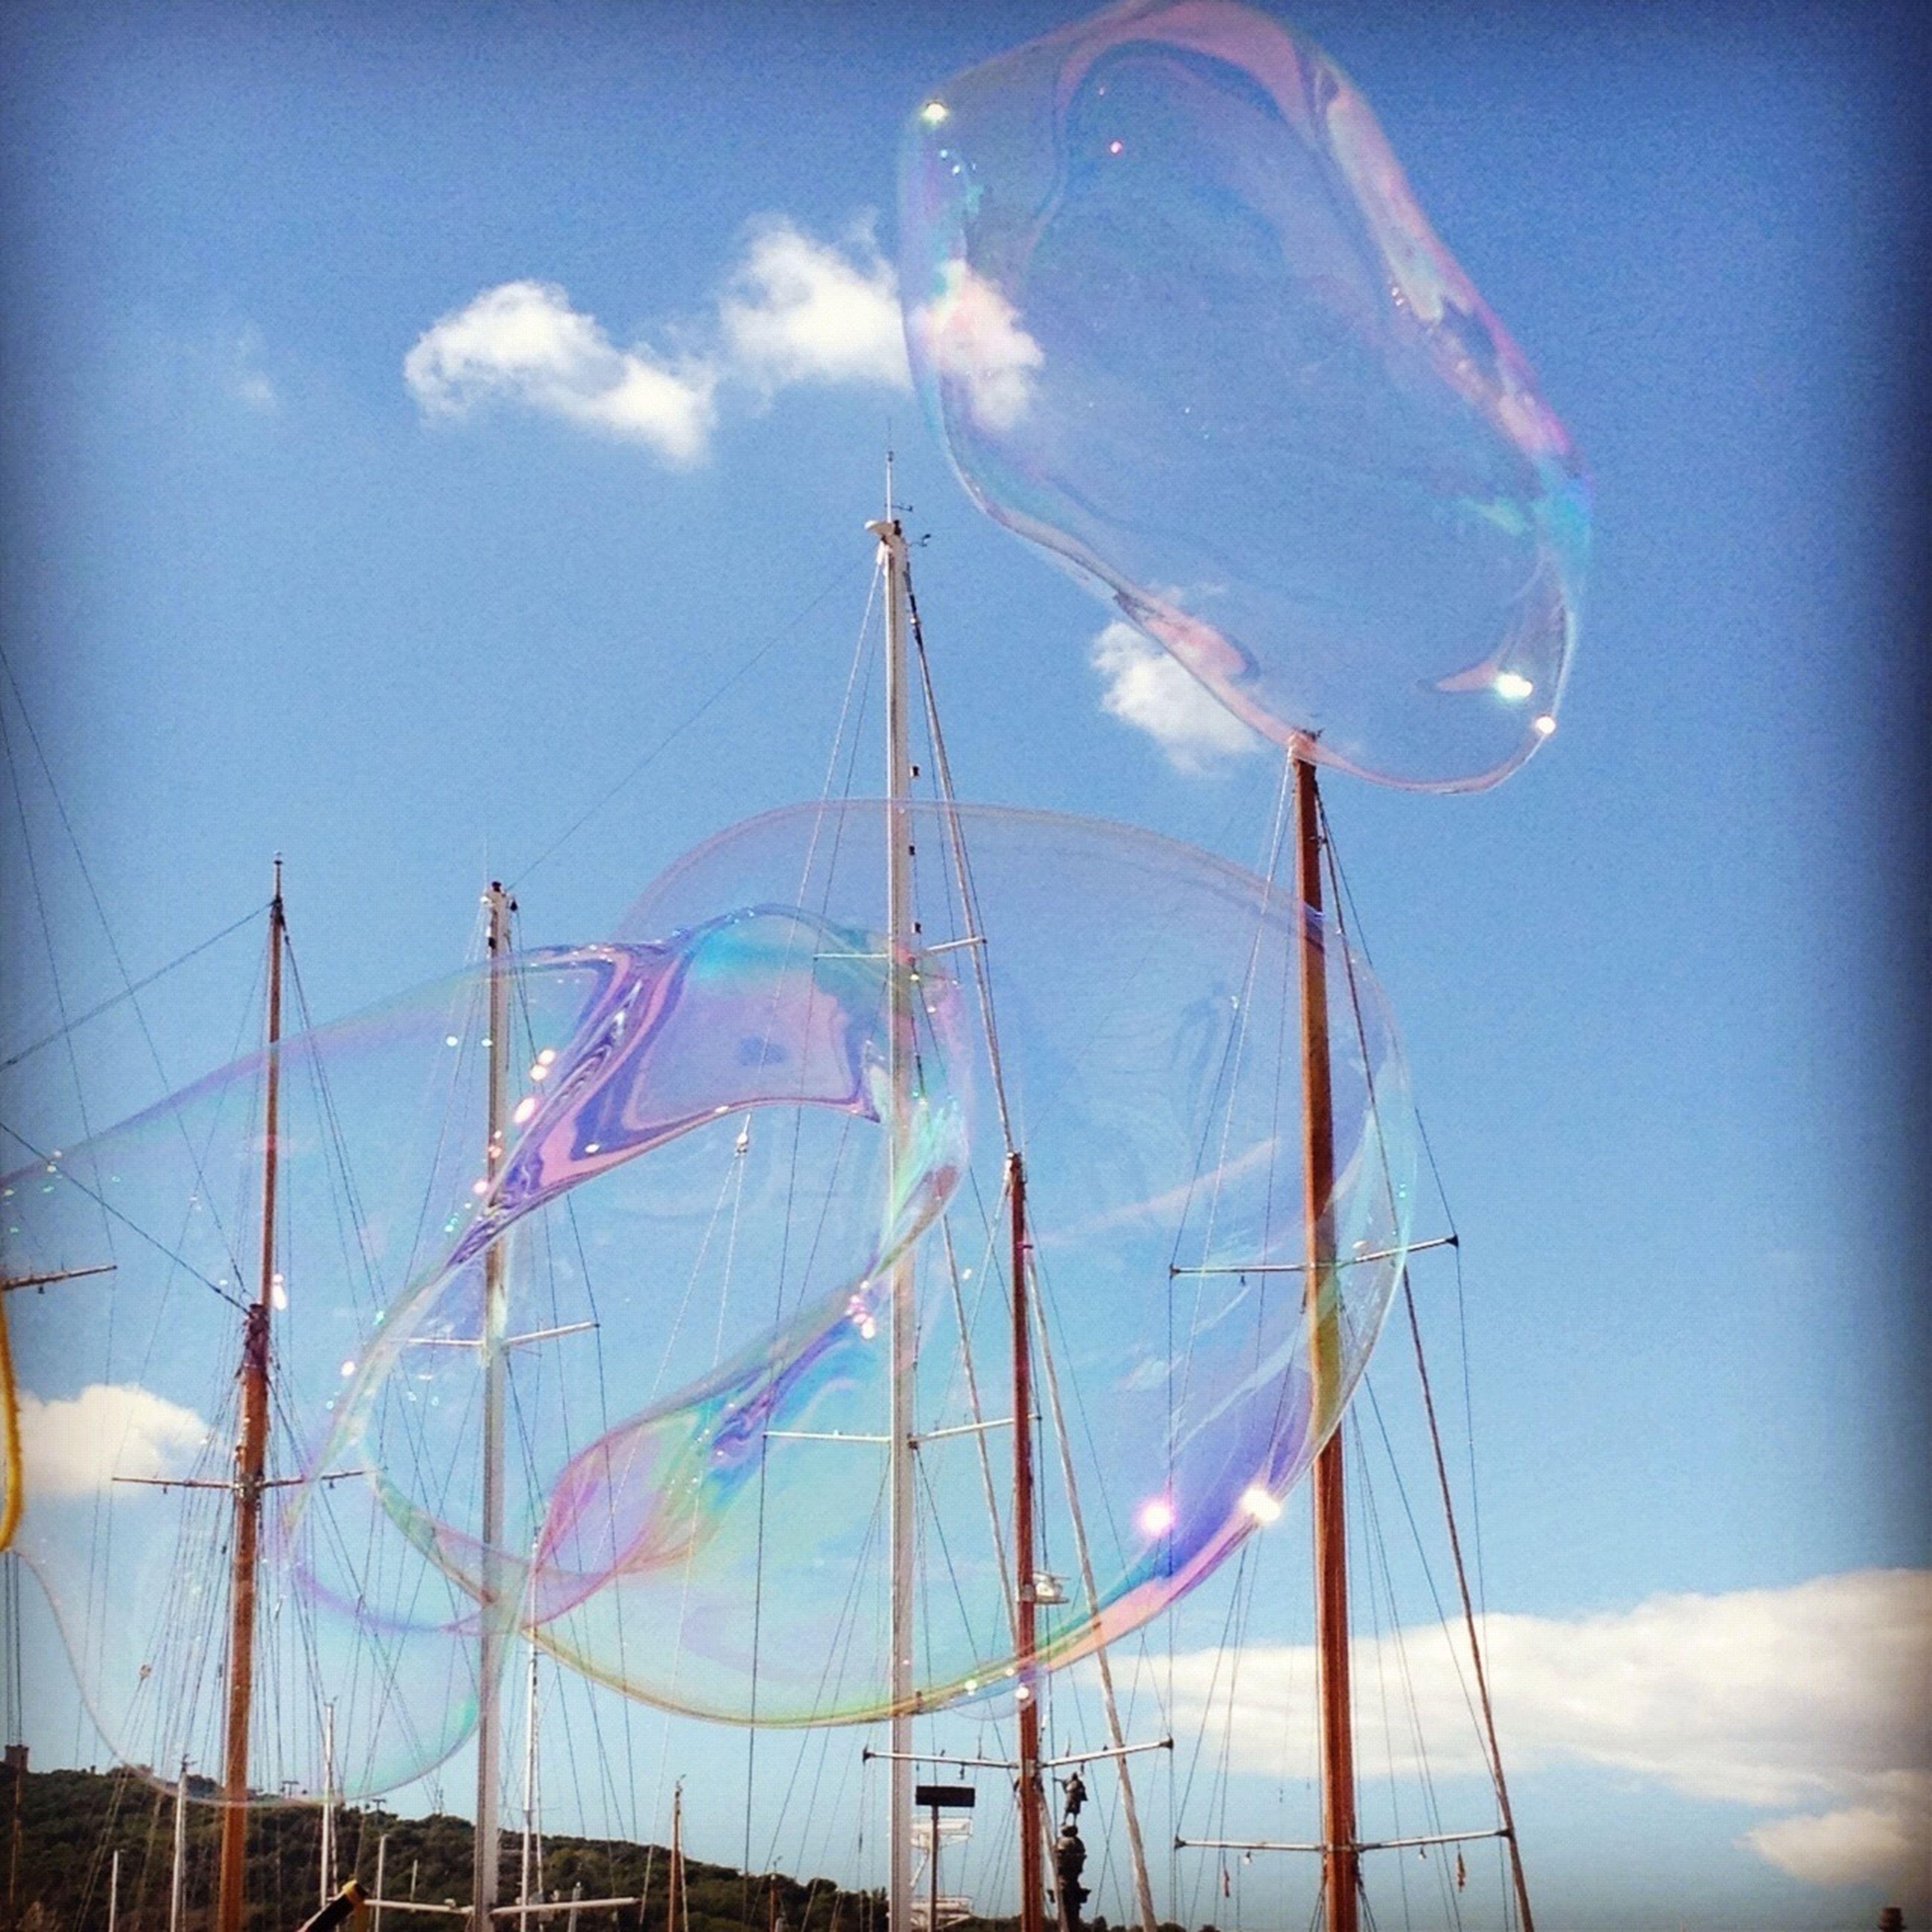 sky, nautical vessel, cloud - sky, low angle view, transportation, amusement park, mode of transport, blue, amusement park ride, boat, mast, cloud, fun, day, outdoors, enjoyment, ferris wheel, arts culture and entertainment, cloudy, rope